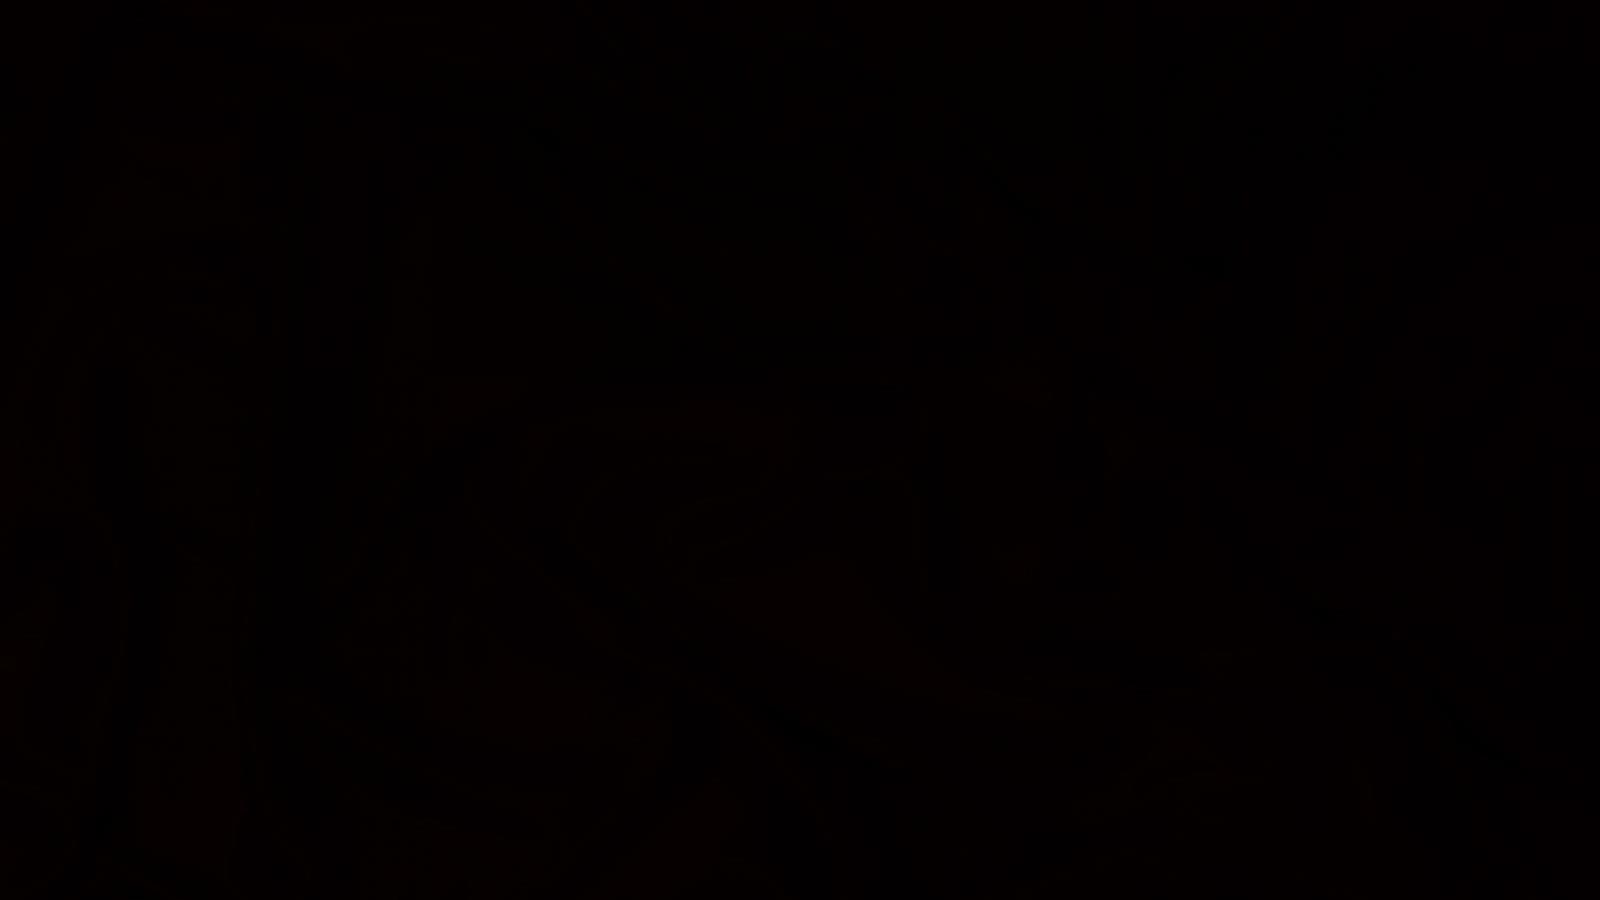 بالصور خلفية سوداء سادة , صور سوداء ساده 3612